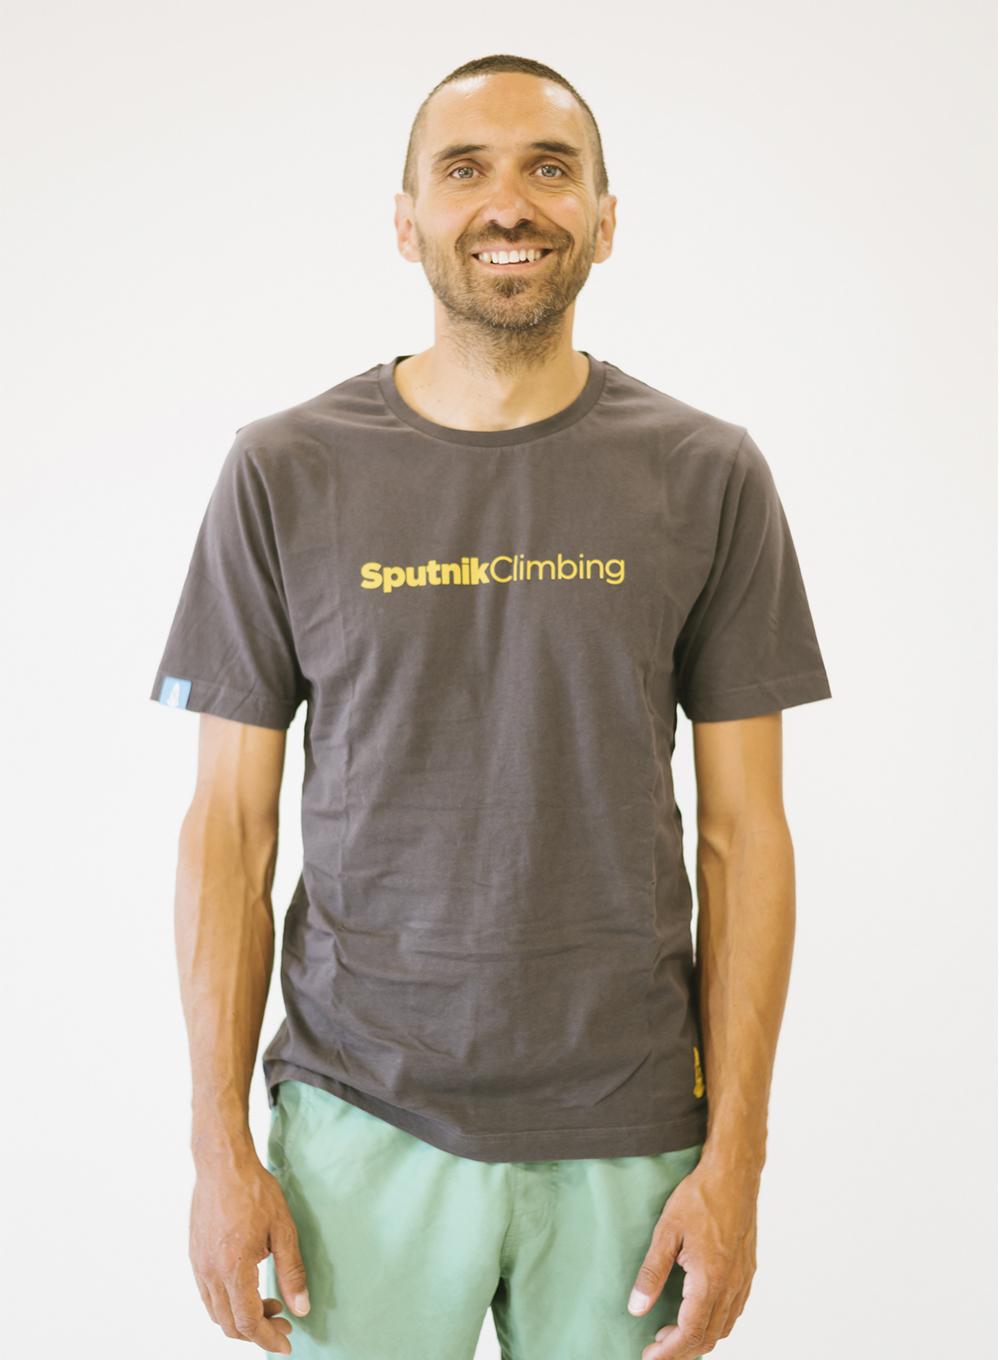 Javi con camiseta gris Sputnik